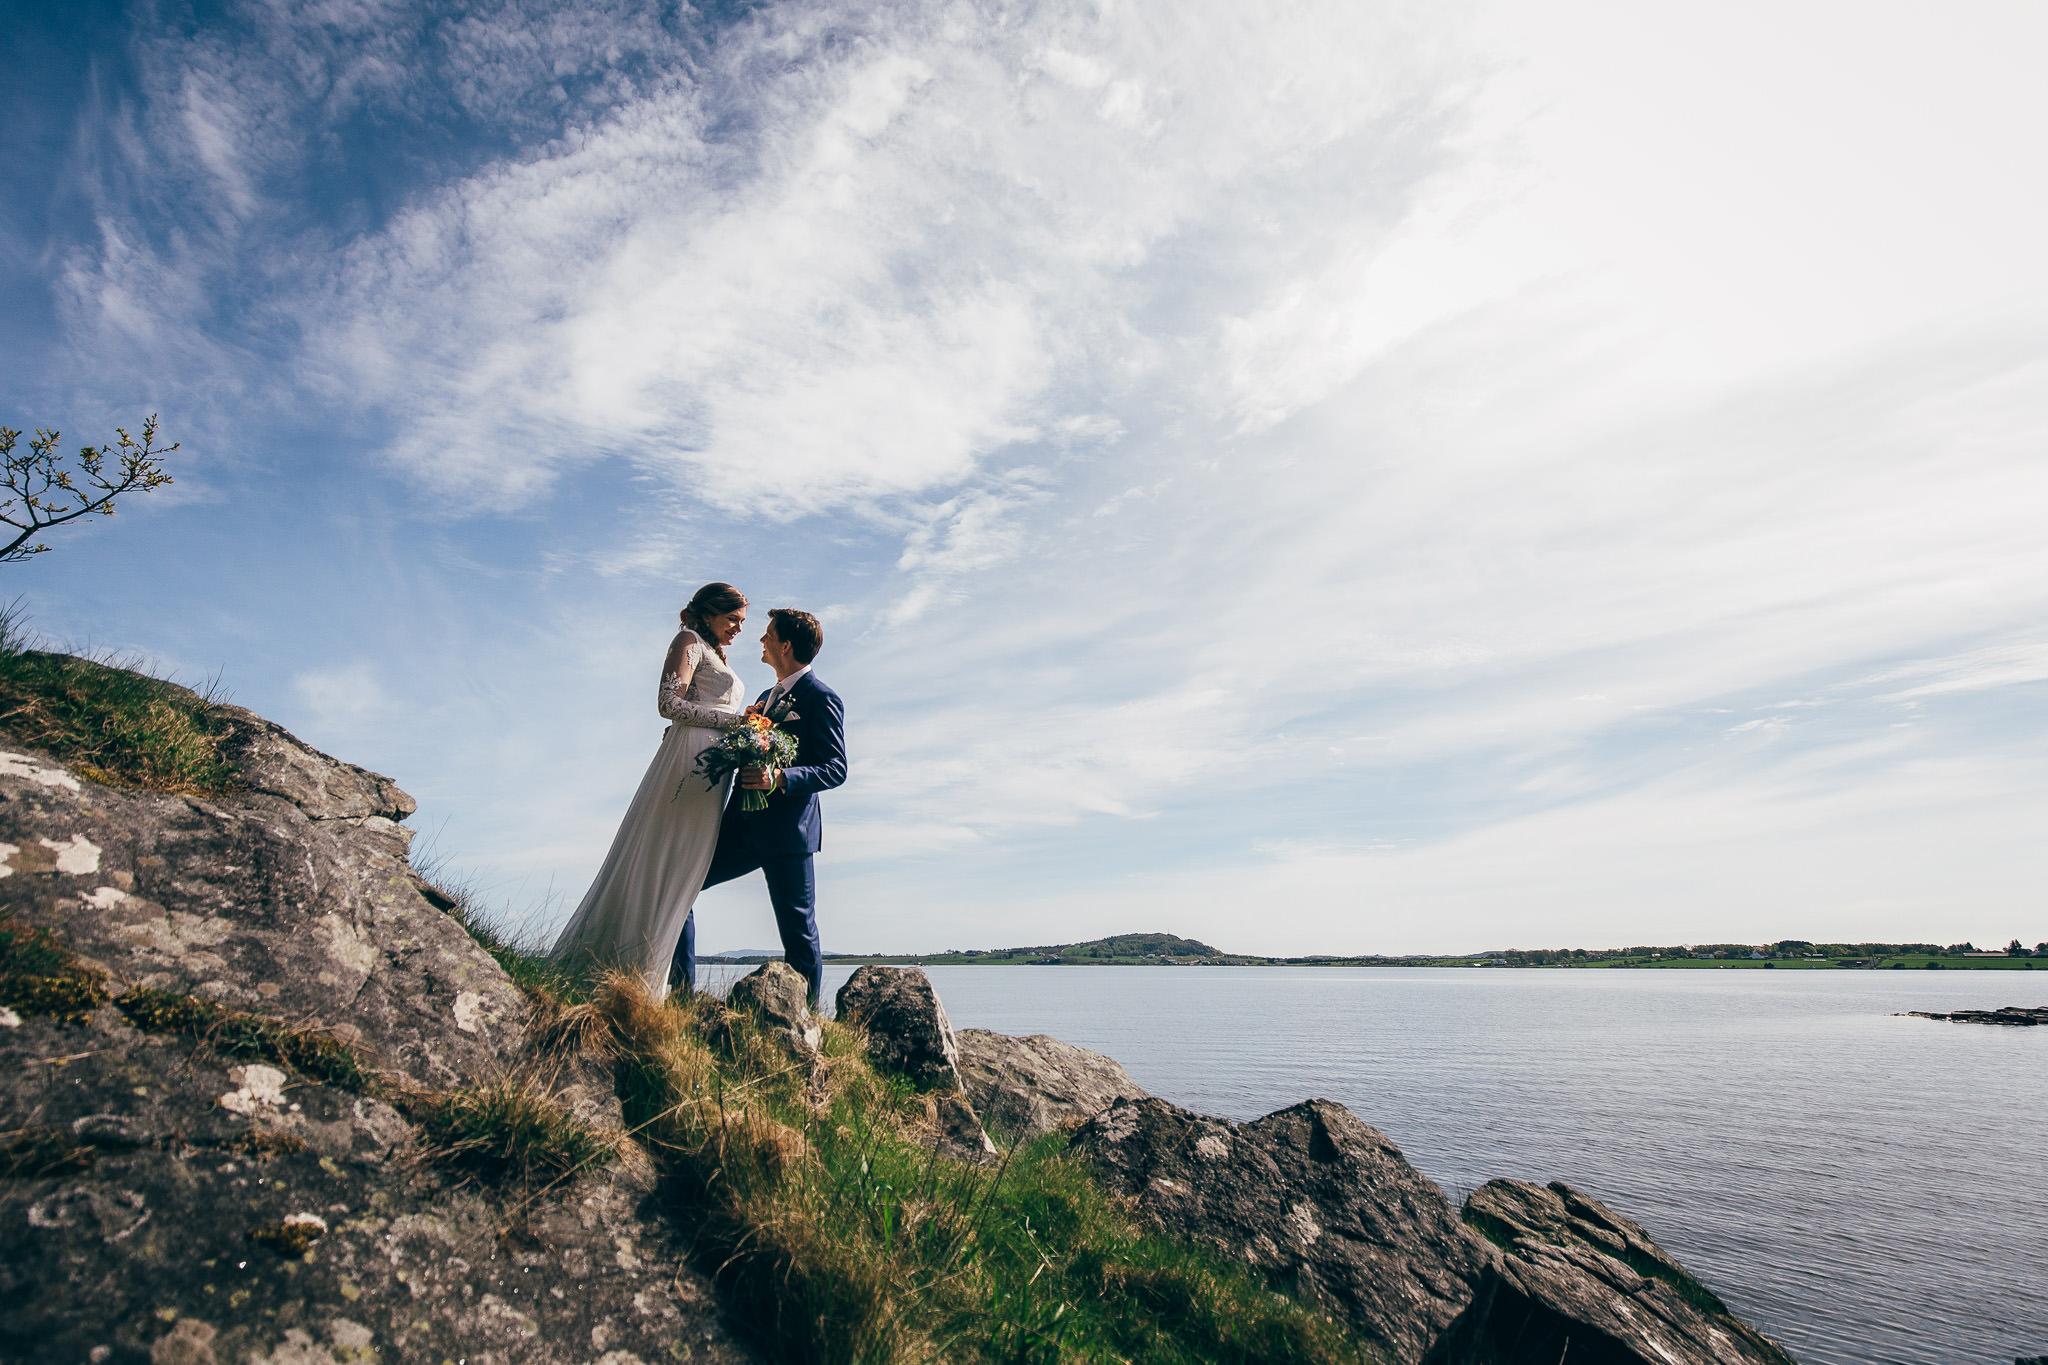 Wedding+Photographer+Norway+Bryllupsfotograf+Casey+Arneson+-102.jpg